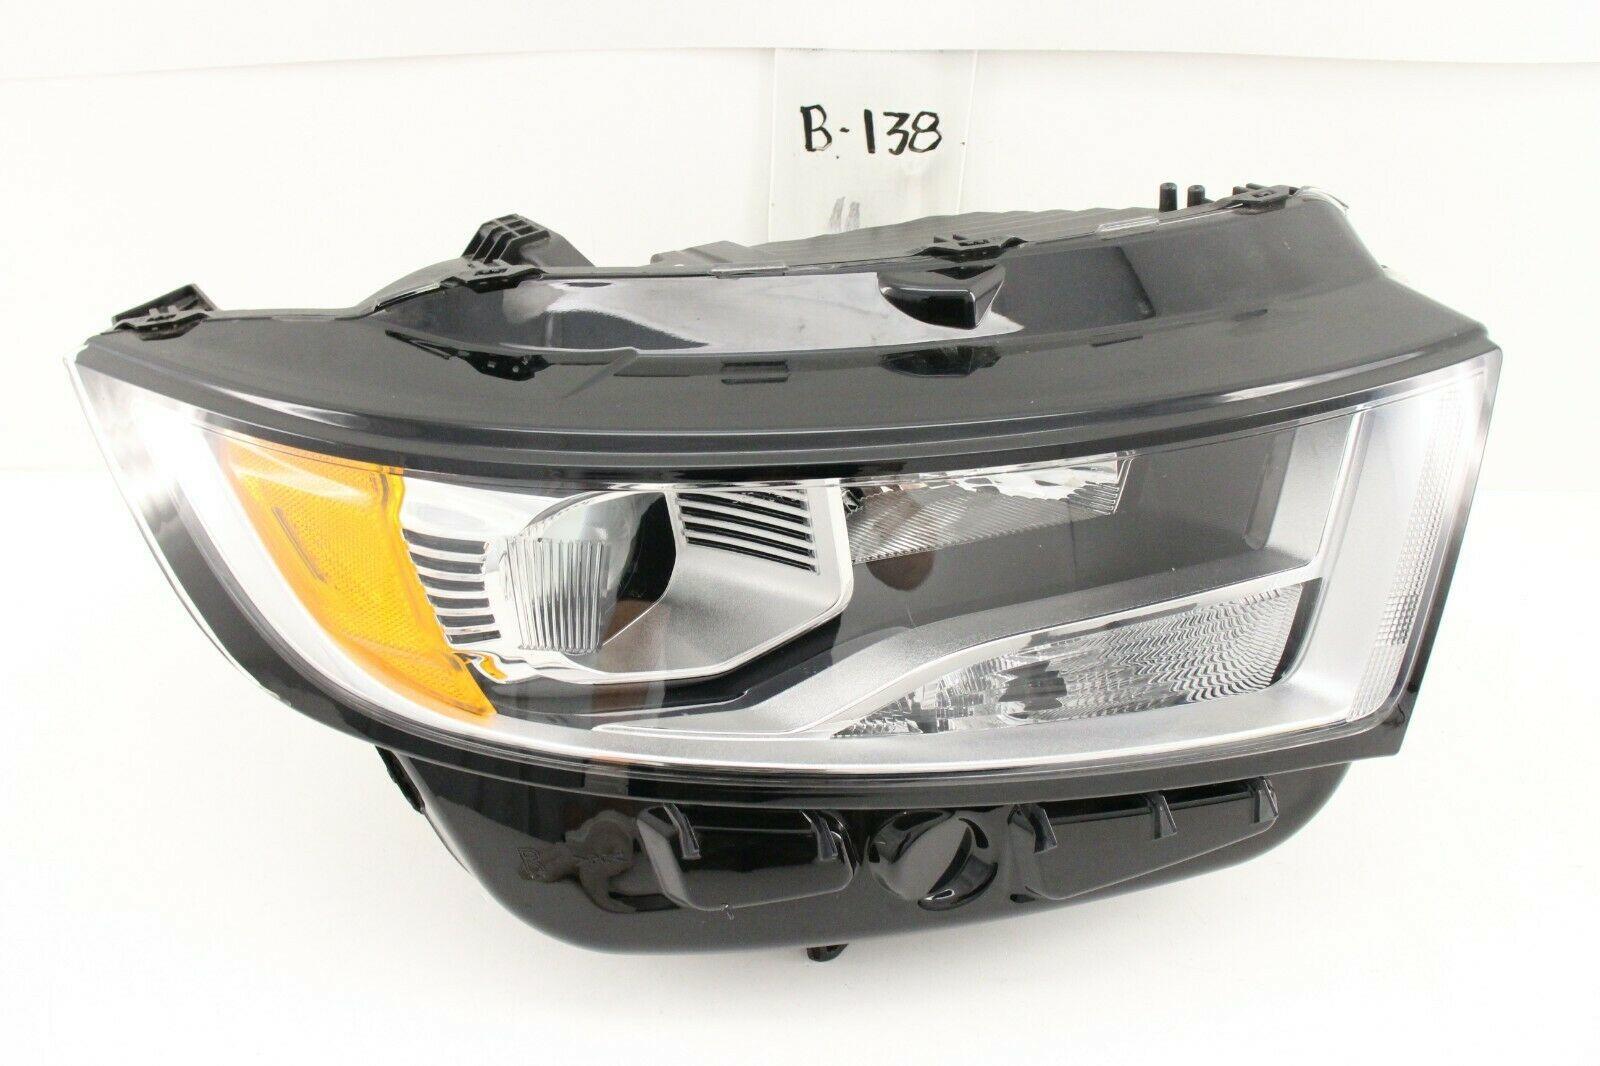 USED OEM HEAD LIGHT HEADLIGHT LAMP HEADLAMP XENON 15-18 ford edge RH chip mount - $371.25